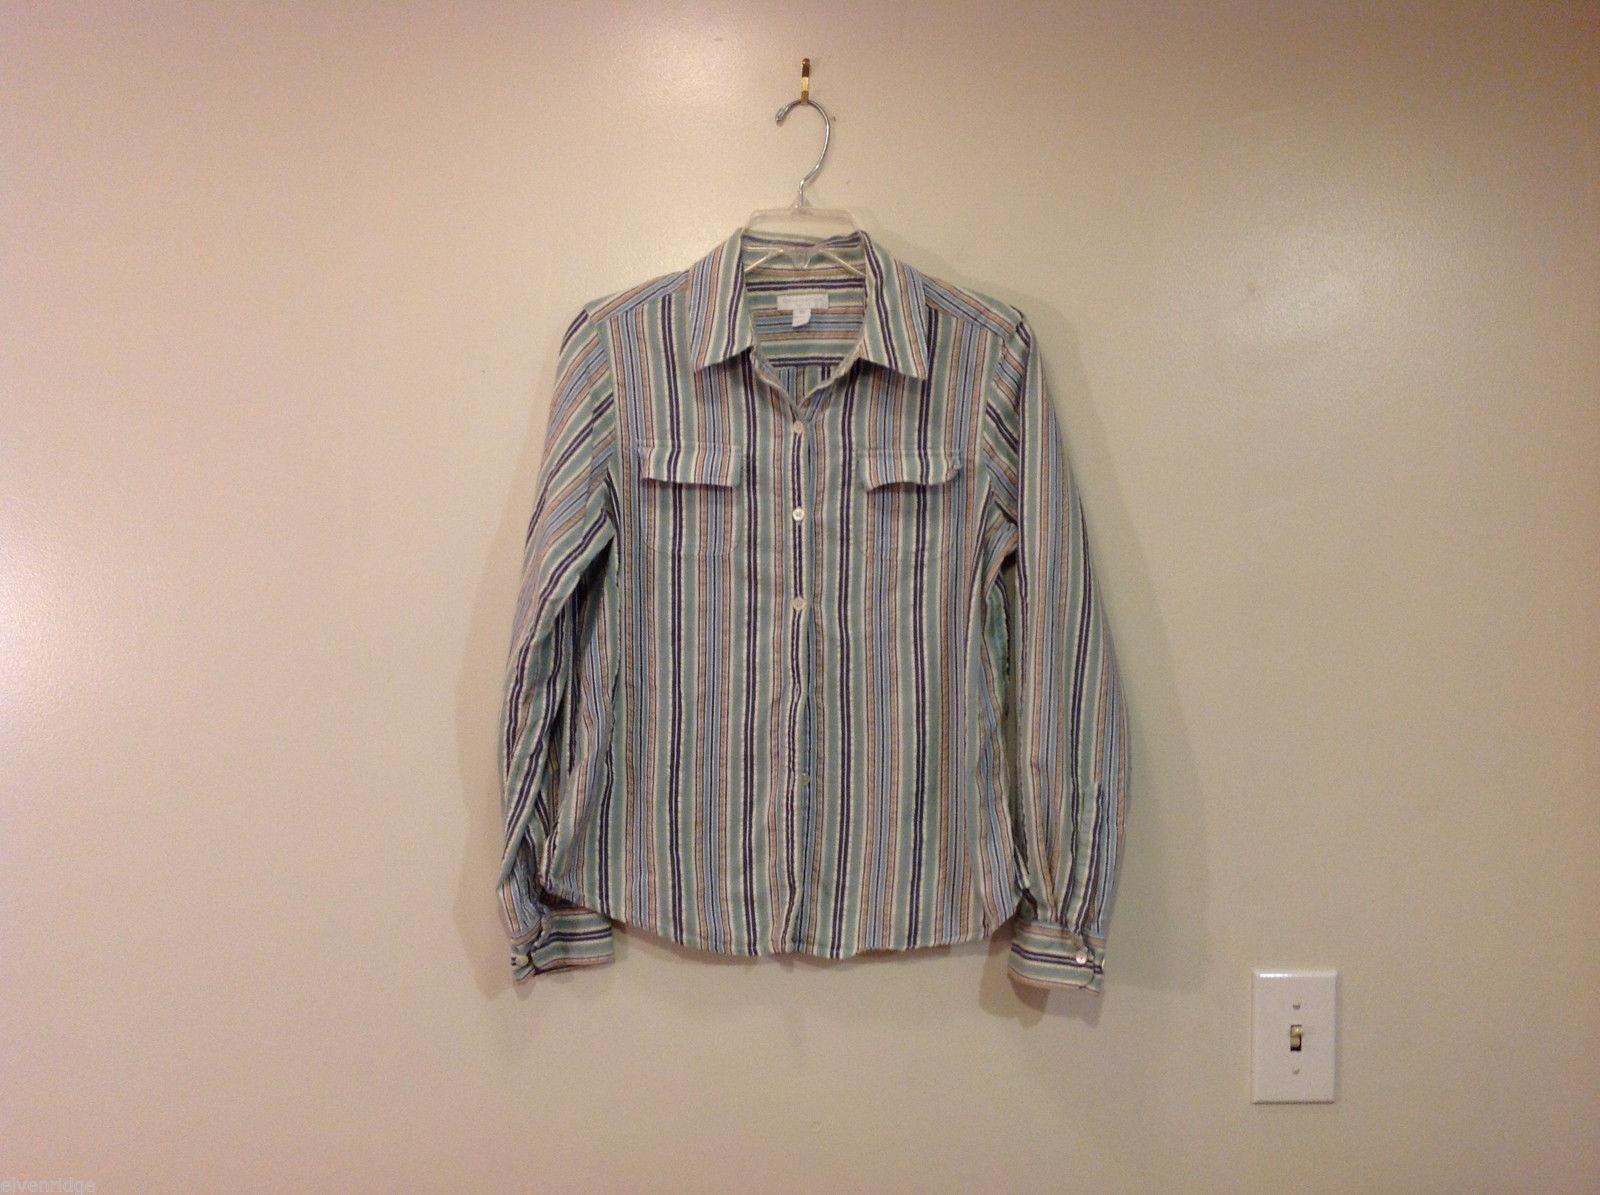 Charter Club Petite Multi Striped 100% Cotton Blouse Buttons up Shirt, Size 12P